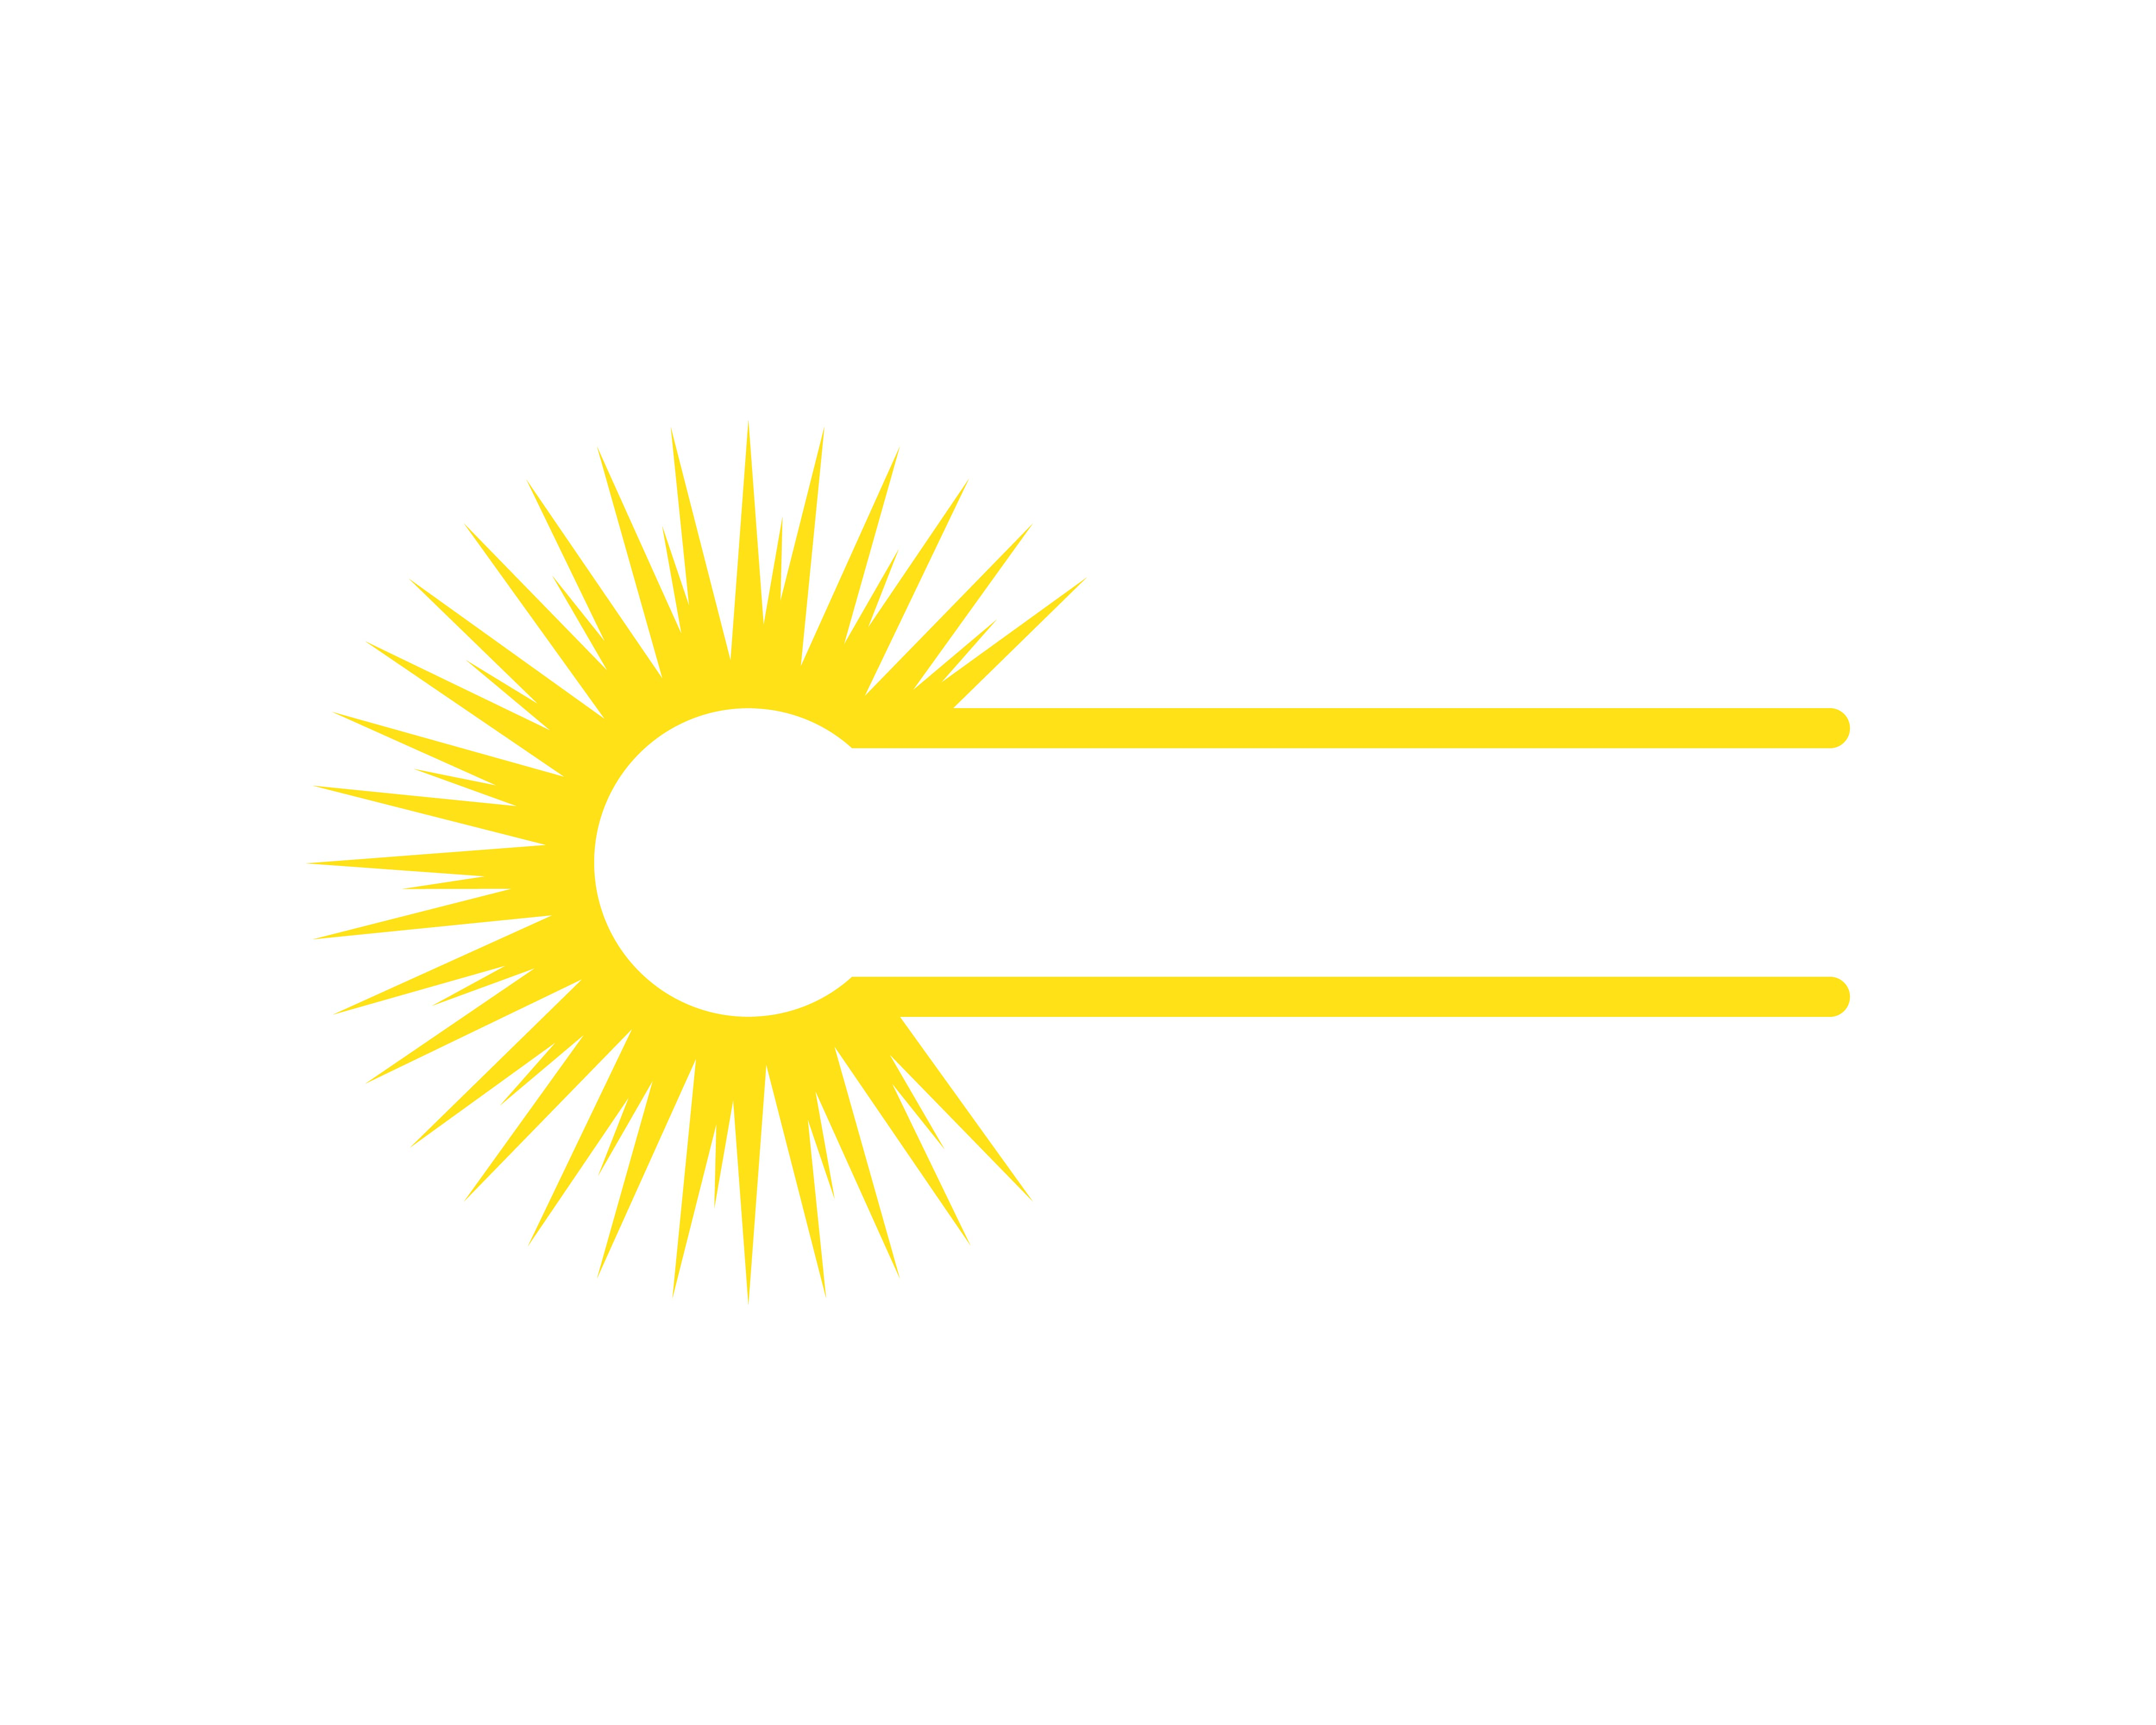 Sun logo and symbols star icon web Vector - - Download ... Symbols Copy And Paste Sun